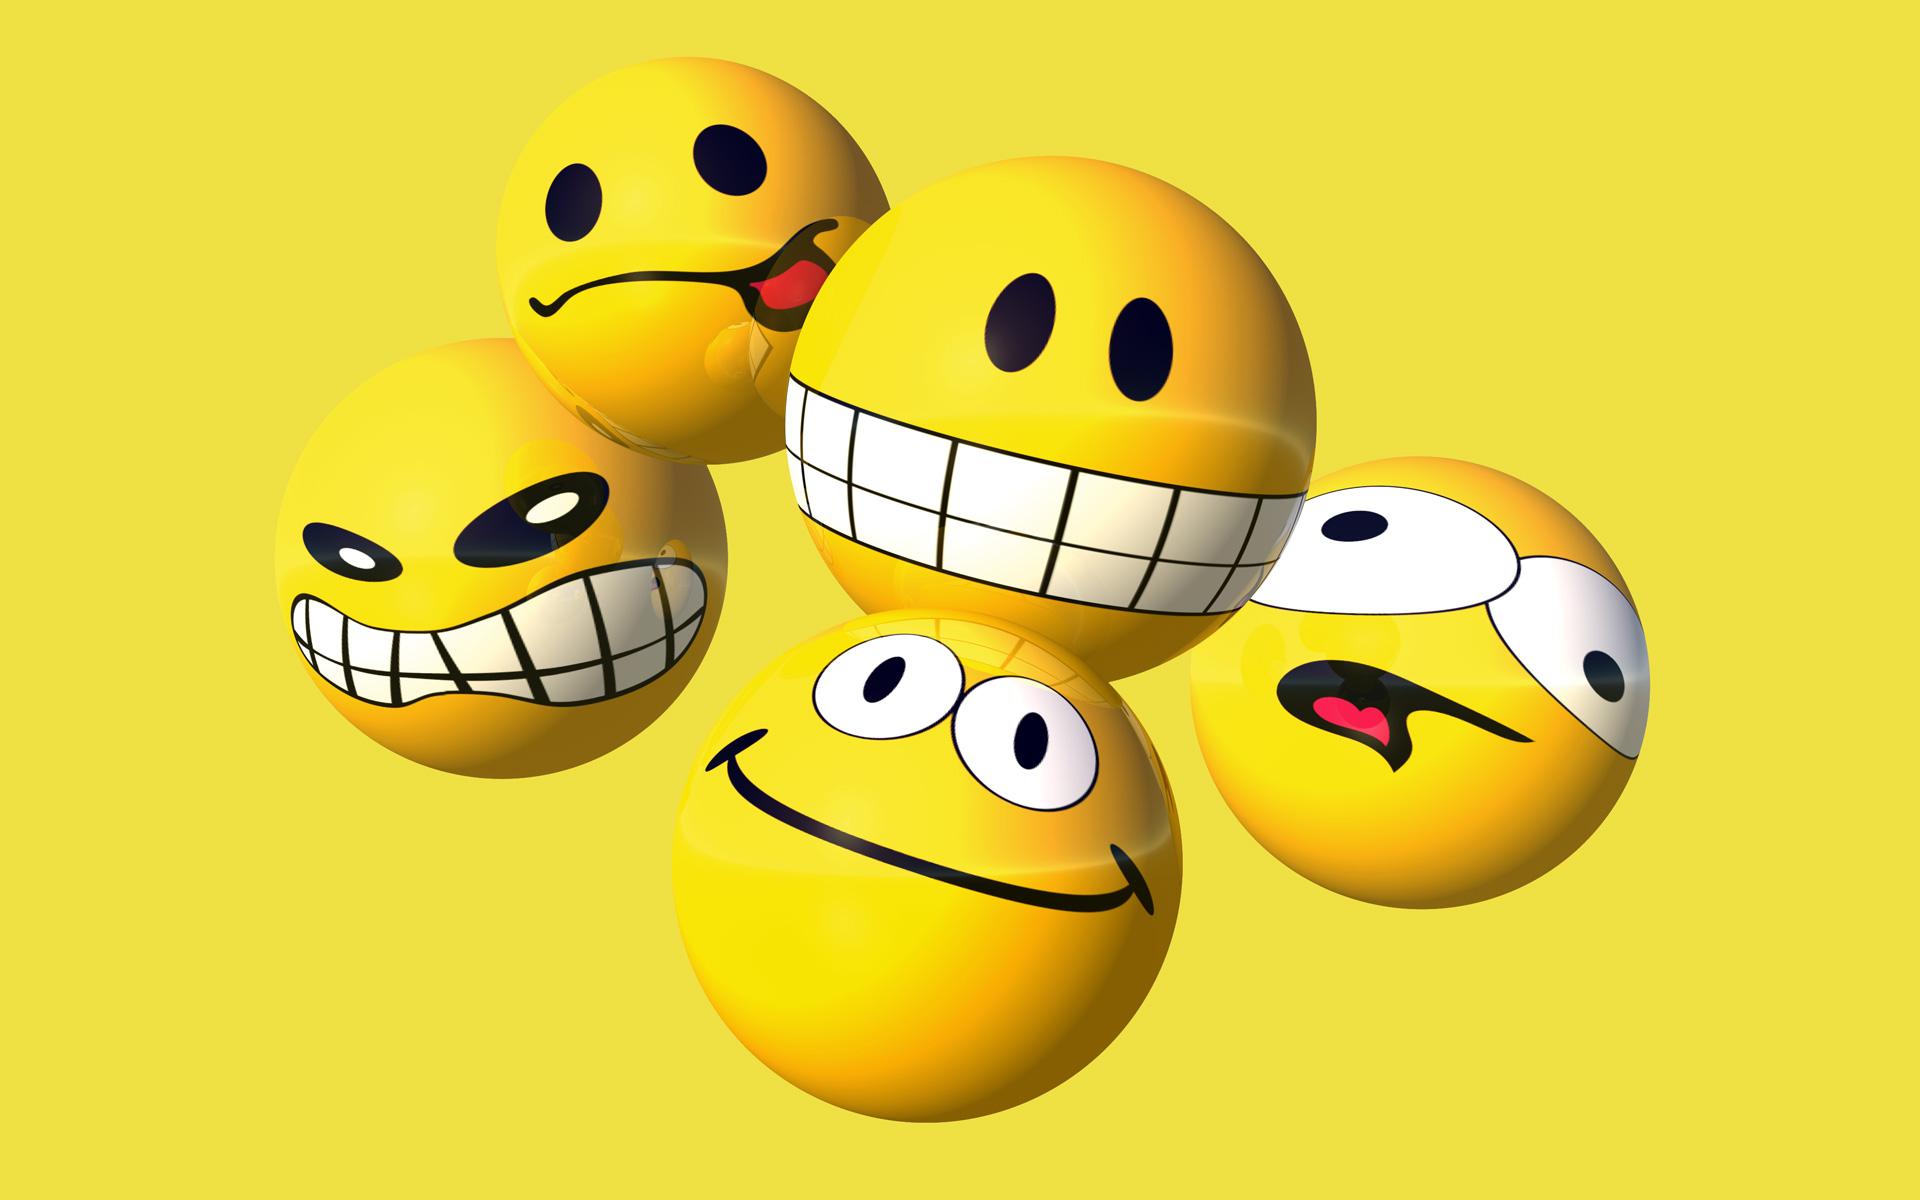 Smiley Attack wallpaper   52827 1920x1200